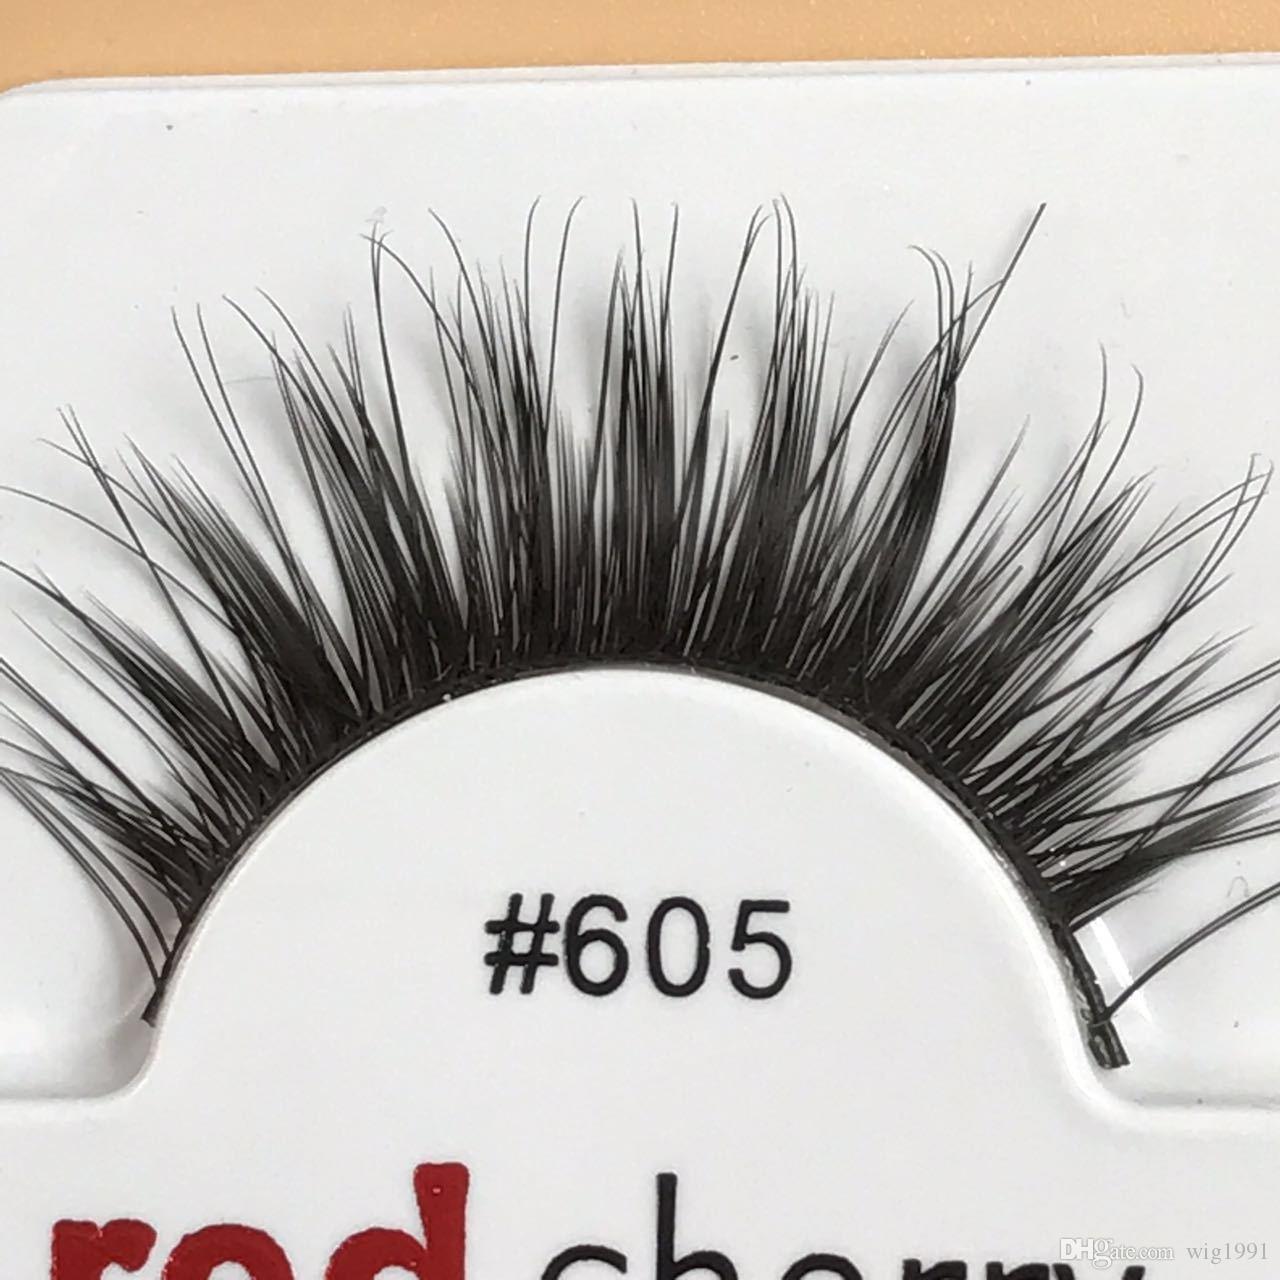 Natural Long Tapered False Eyelashes Soft Red Cherry Eyelashes Human Hair Eye Lashes Makeup Beauty Tools Soft Eyelash Extension